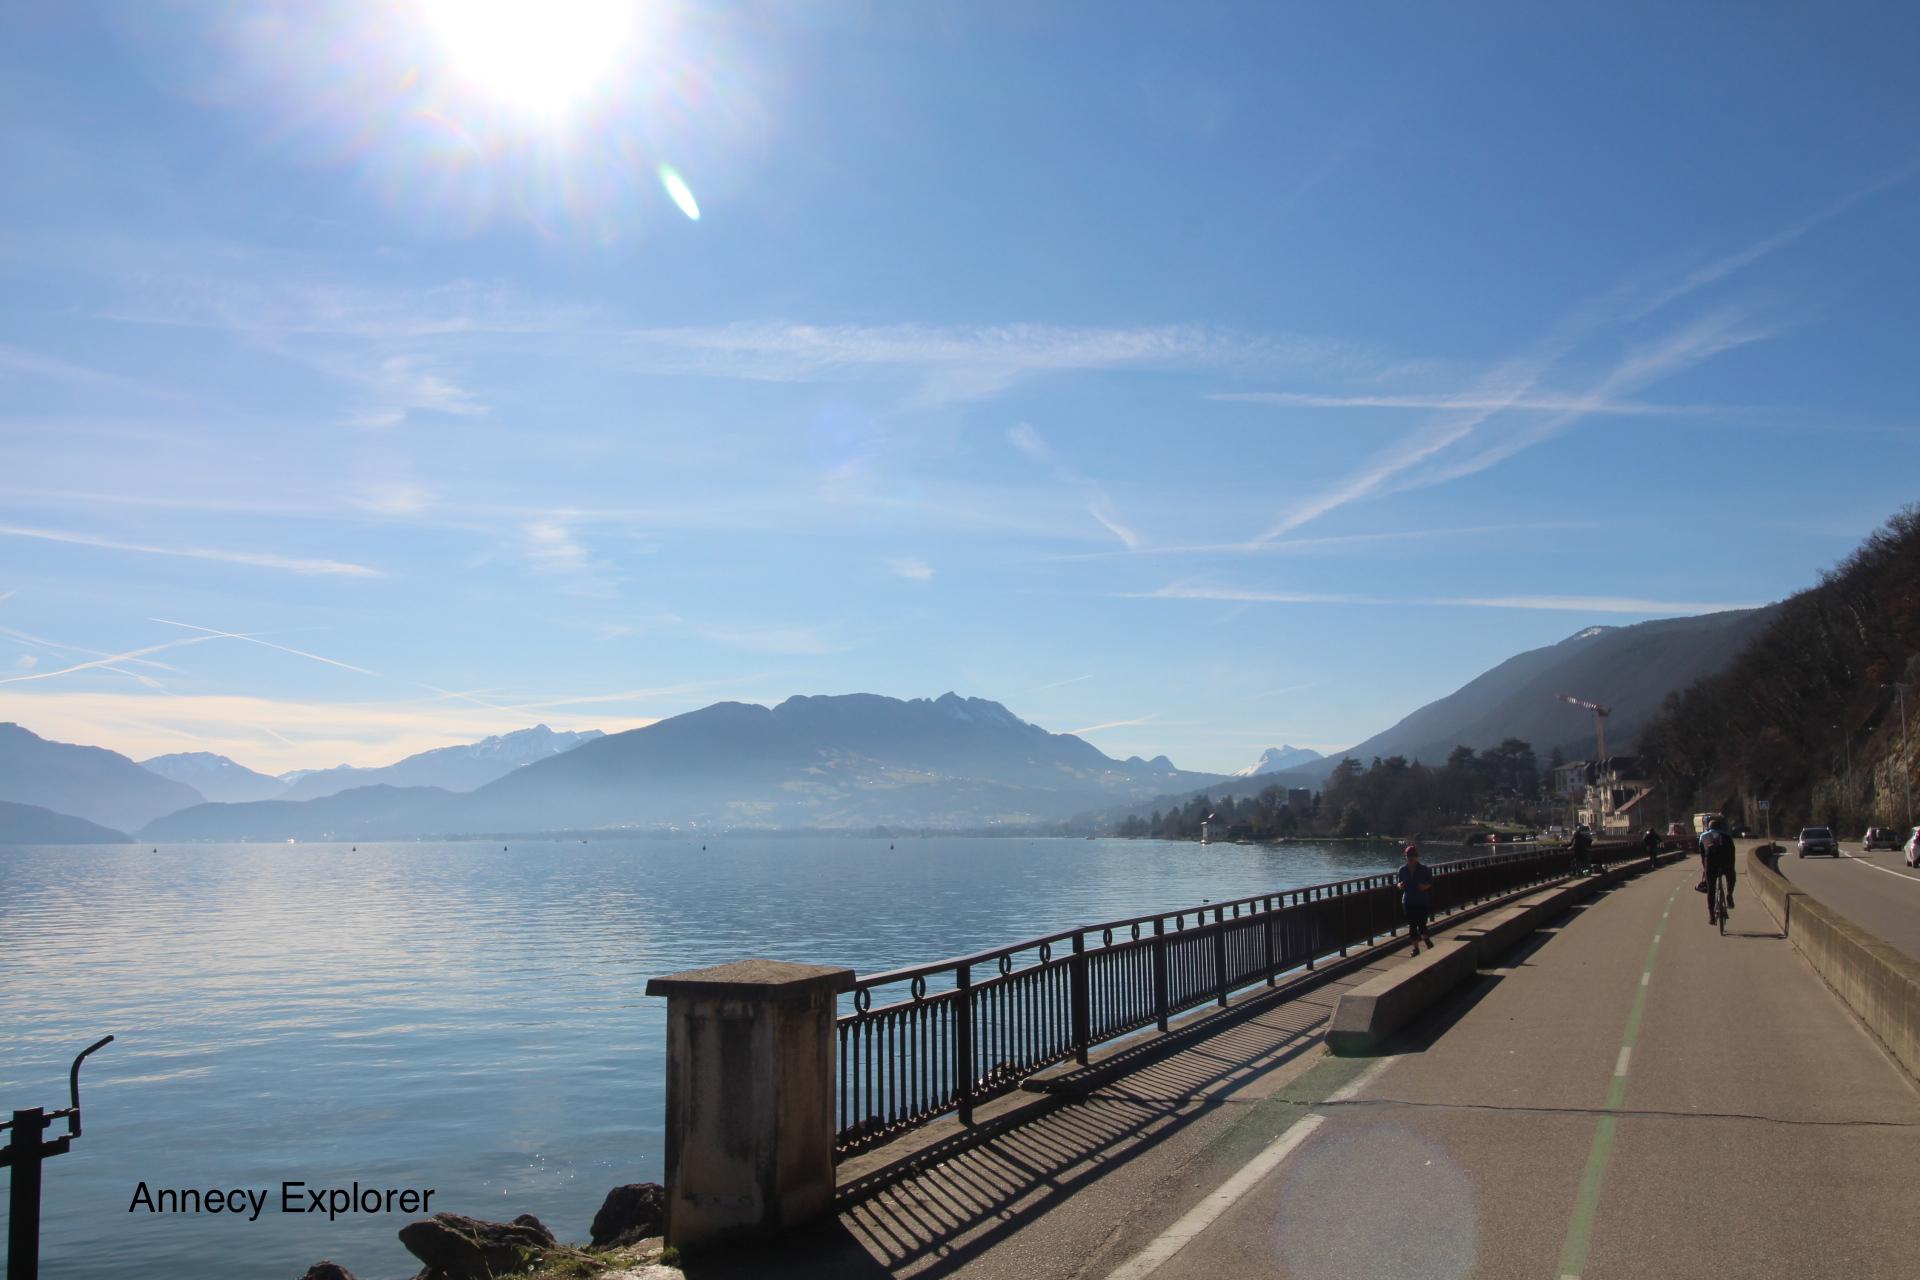 La piste cyclable d'Annecy